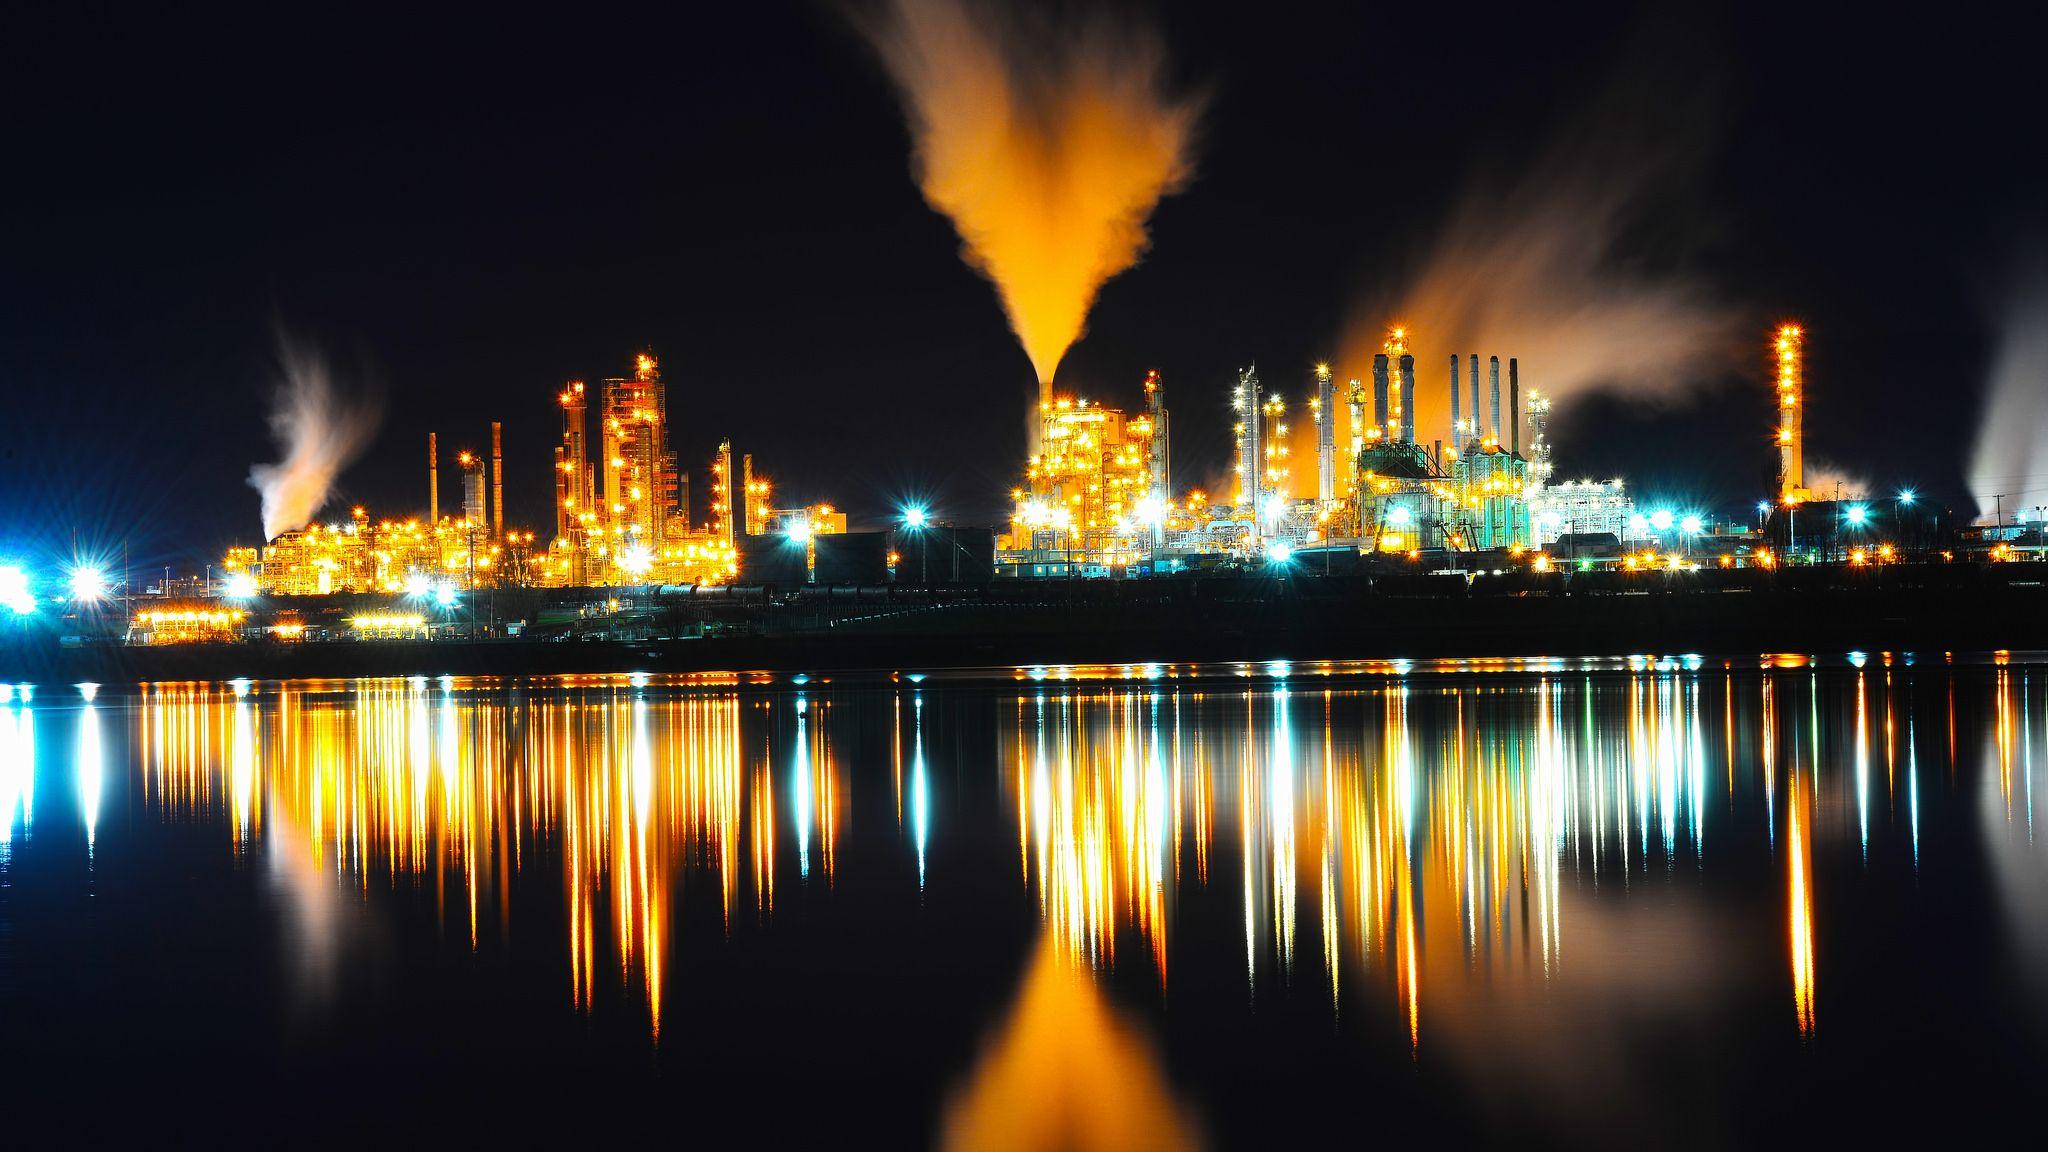 Anacortes Refinery, Washington State | by Don Briggs